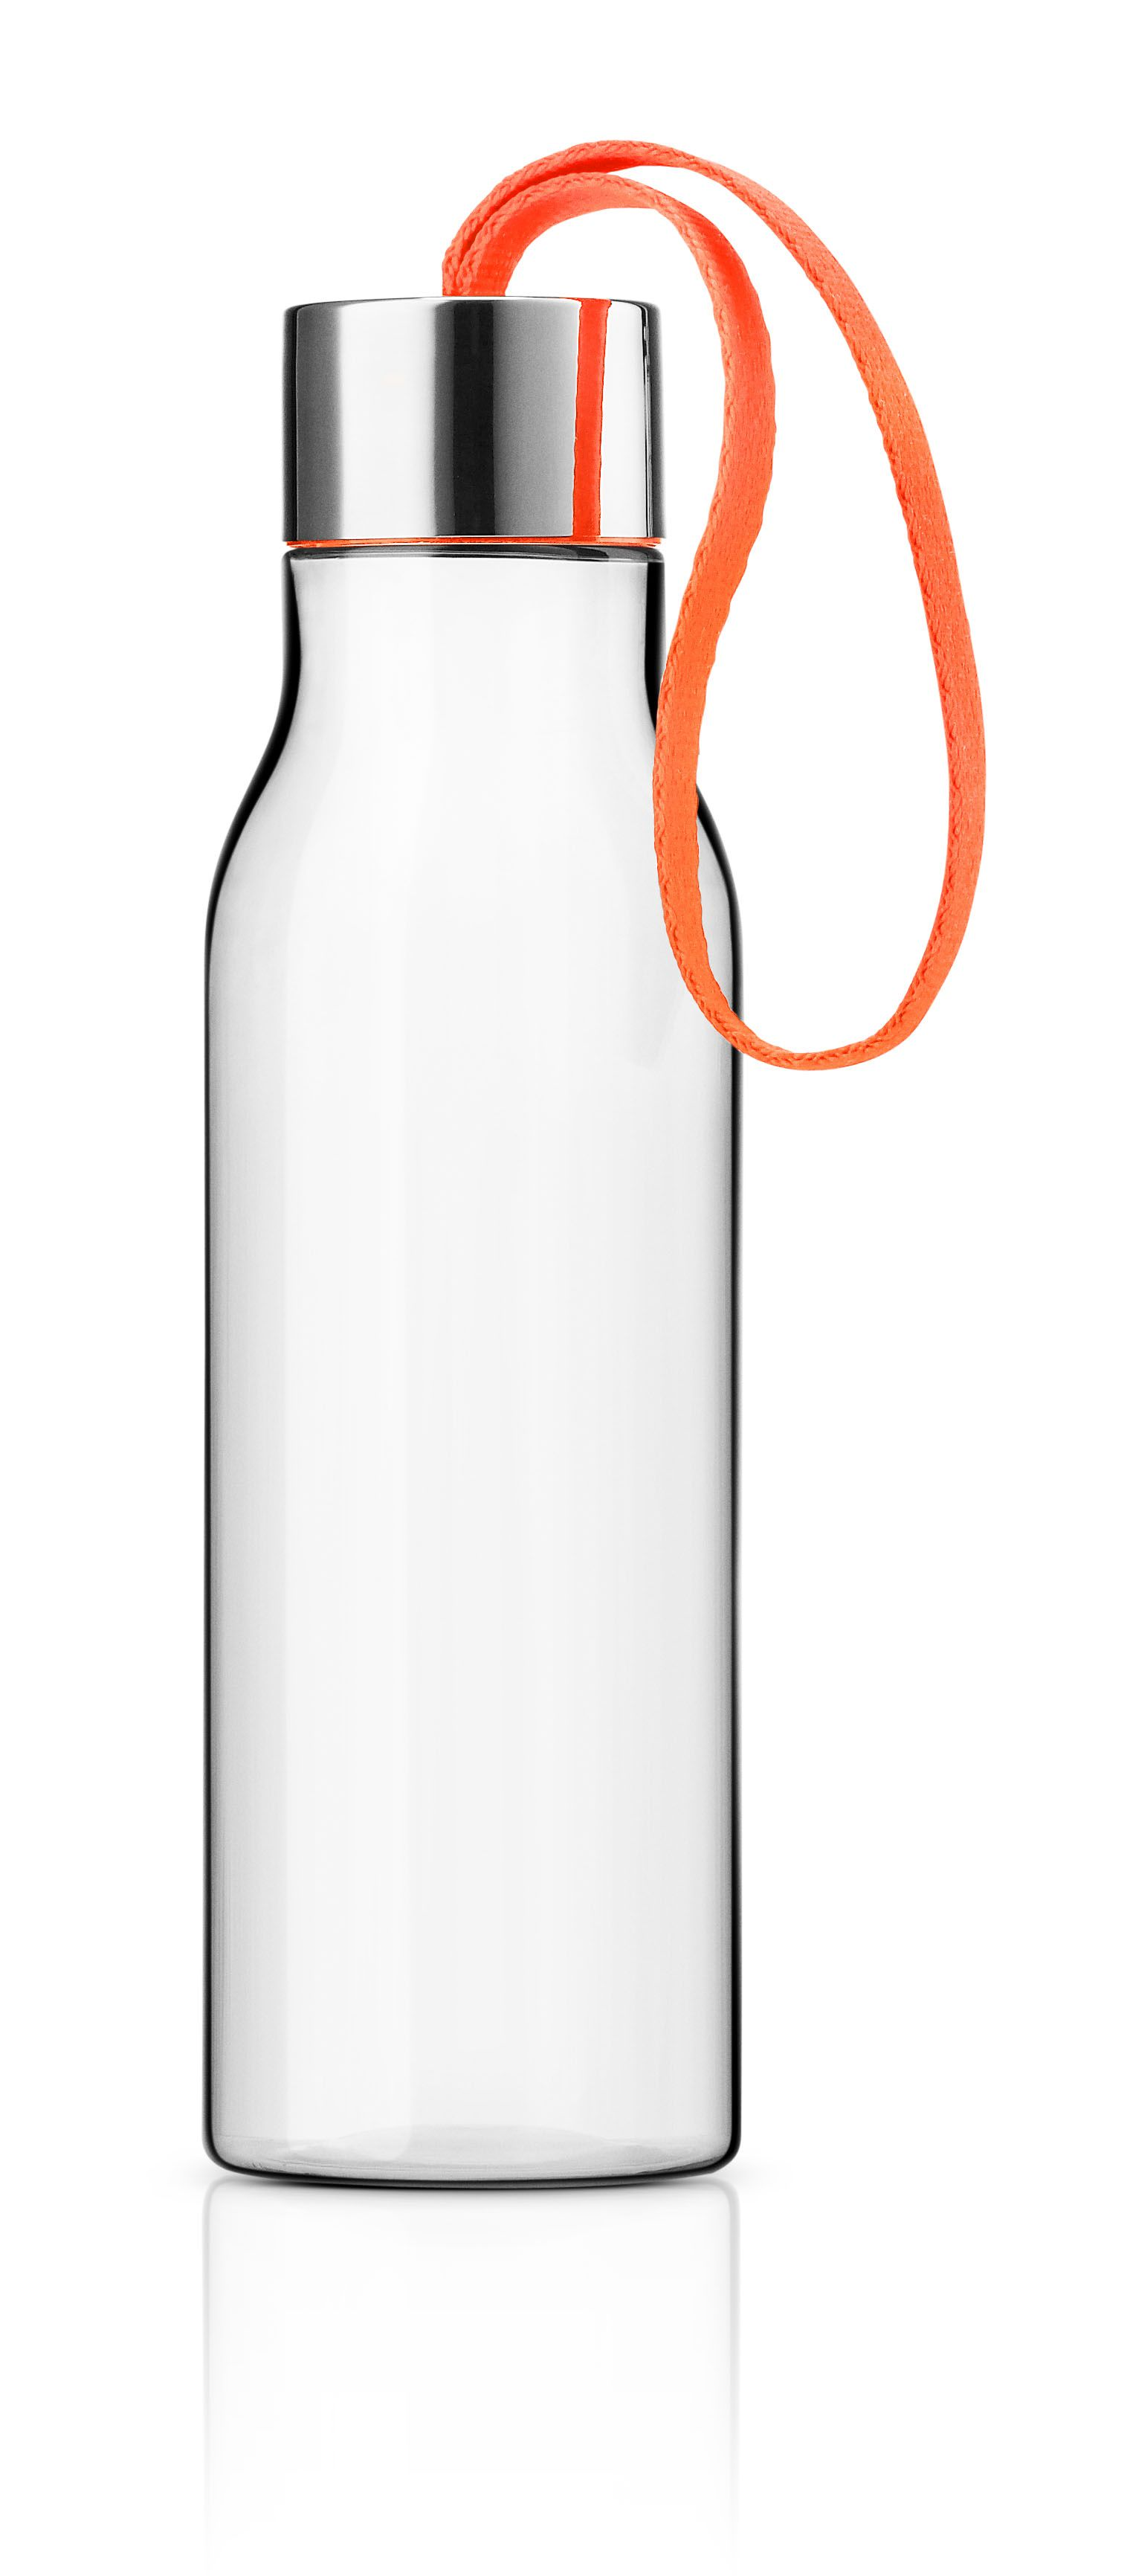 eva_solo_drinkfles_orange.jpg